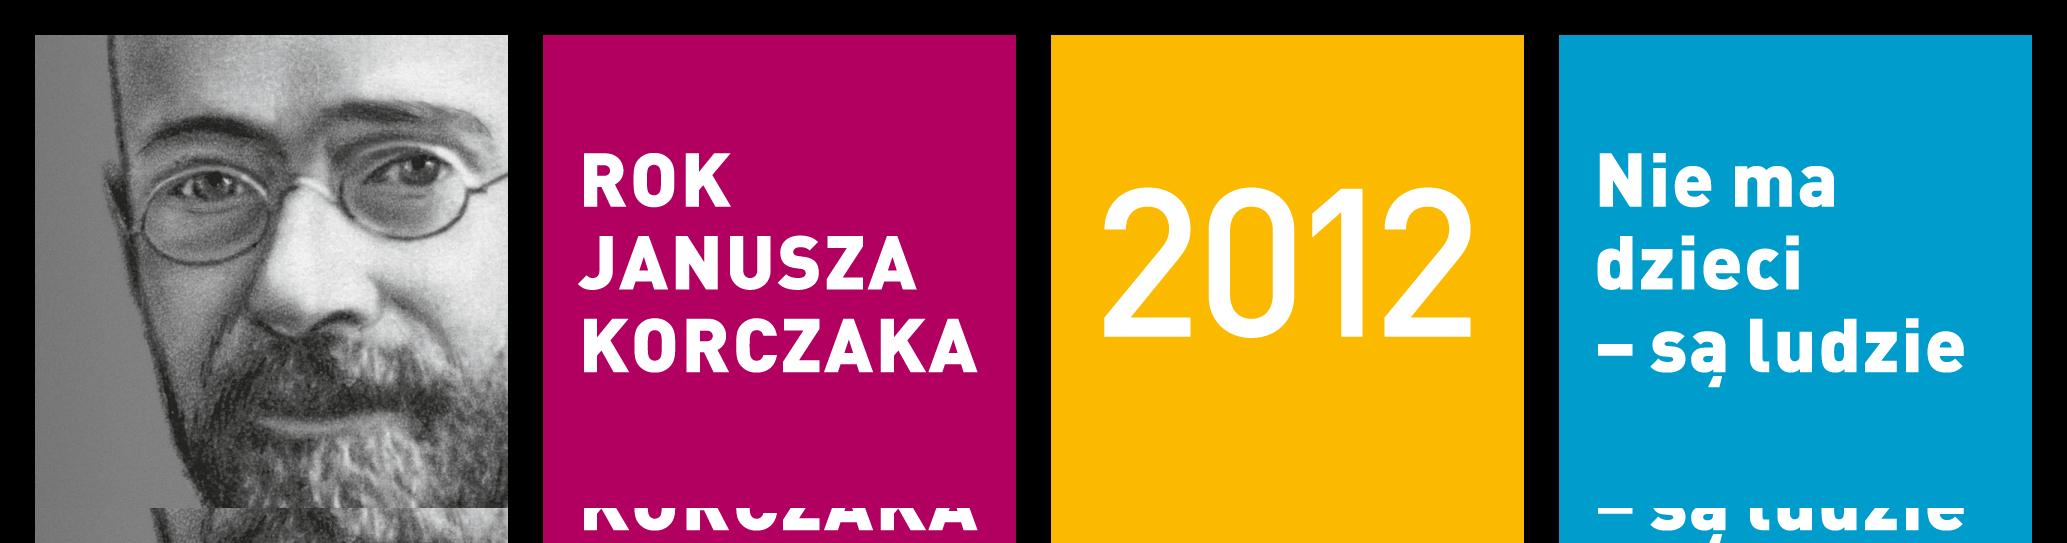 rok_janusza_korczaka_znak